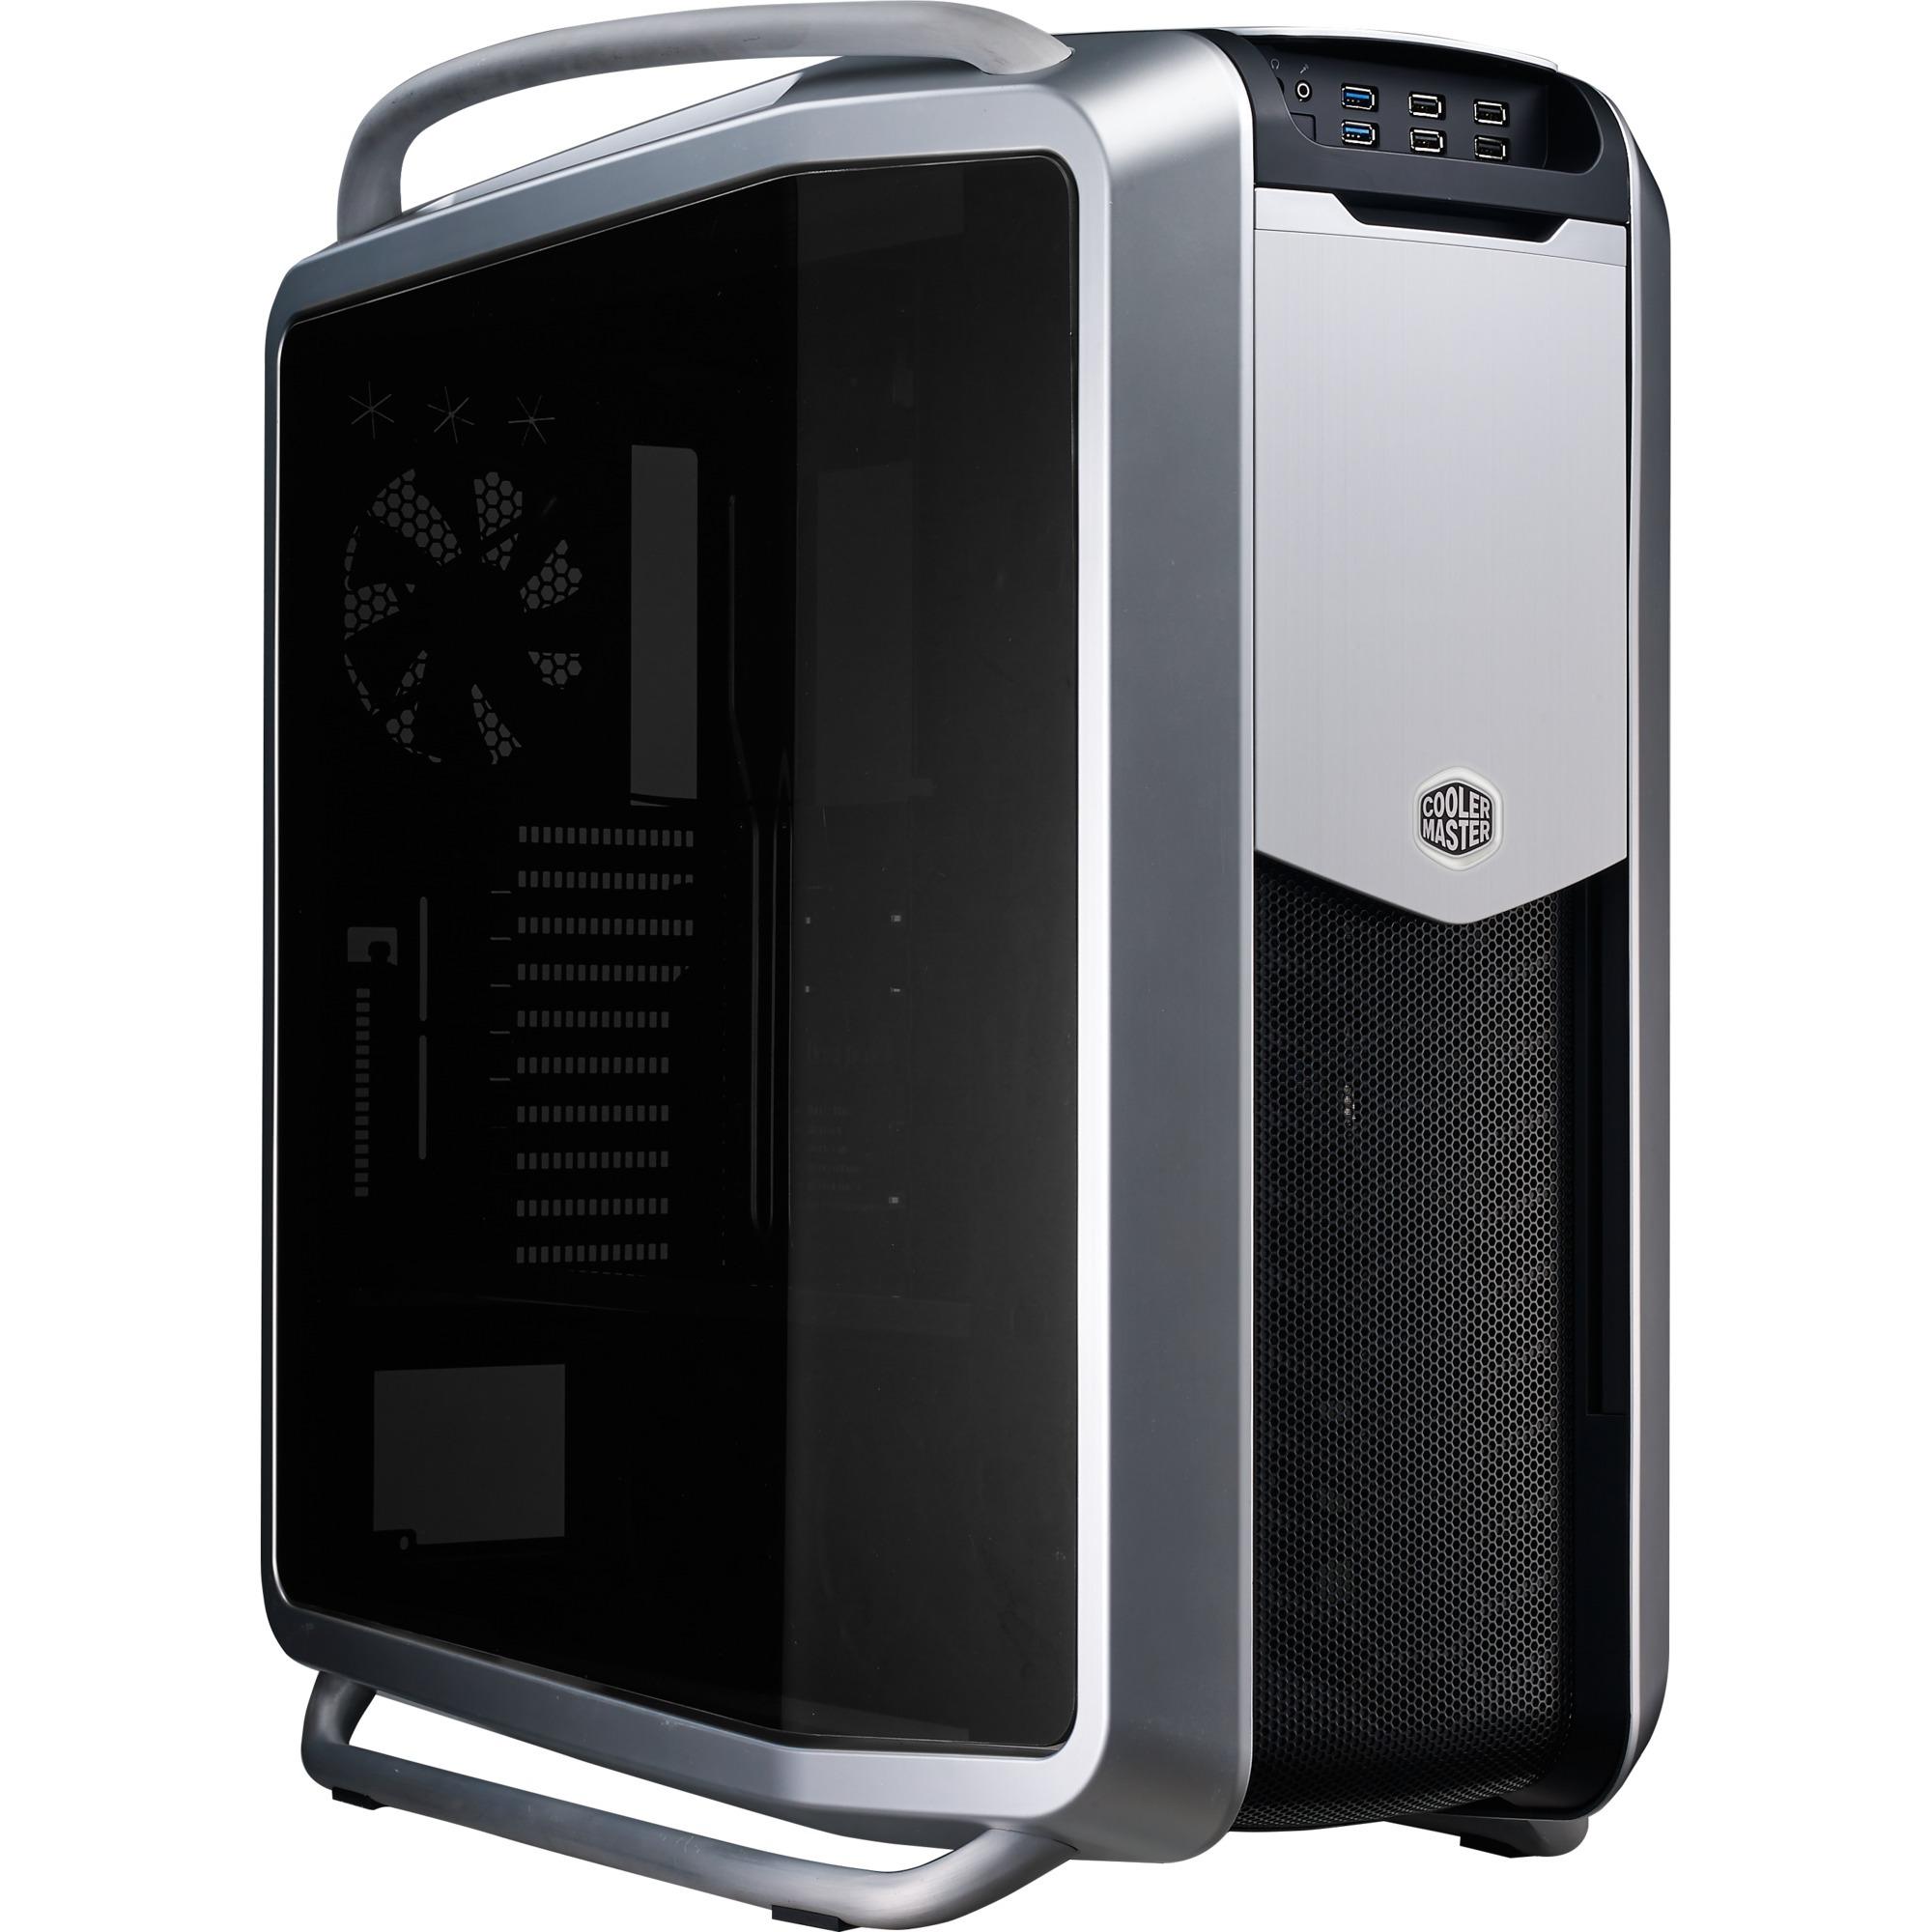 Cosmos II Ultra Tower Negro, Plata carcasa de ordenador, Caja de torre grande